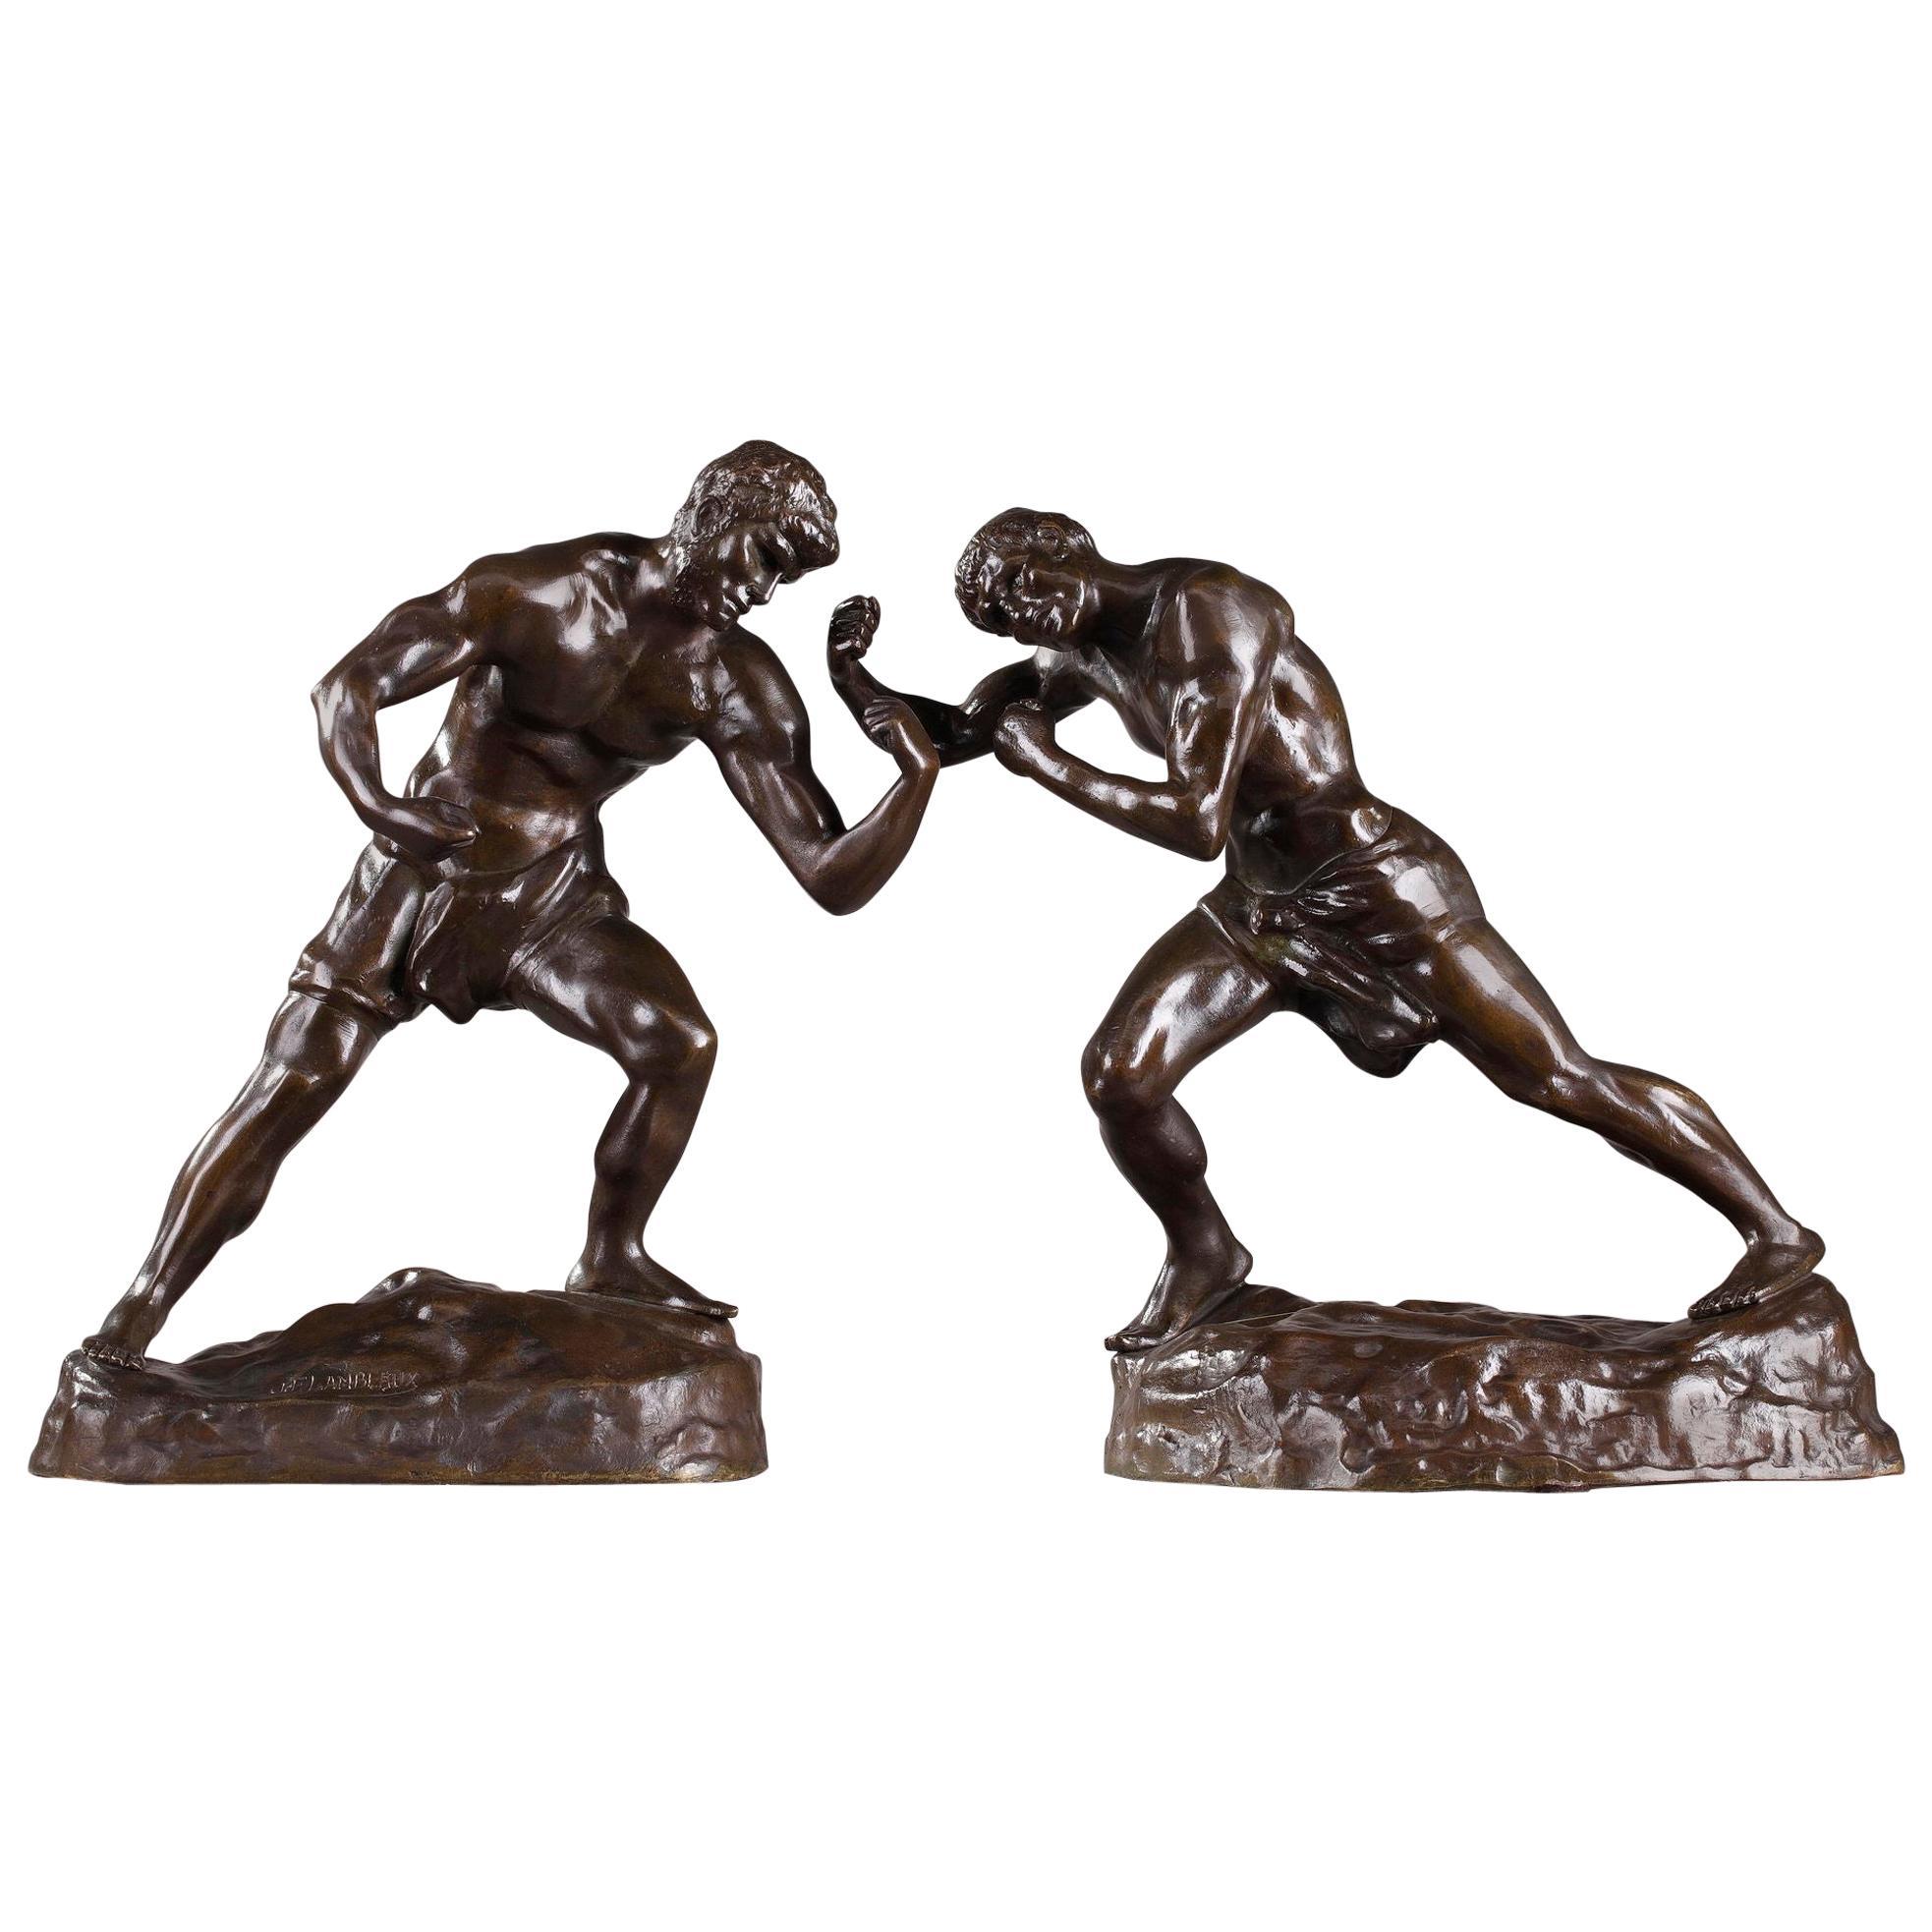 Bronze Statuettes Two Boxers by Jef Lambeaux